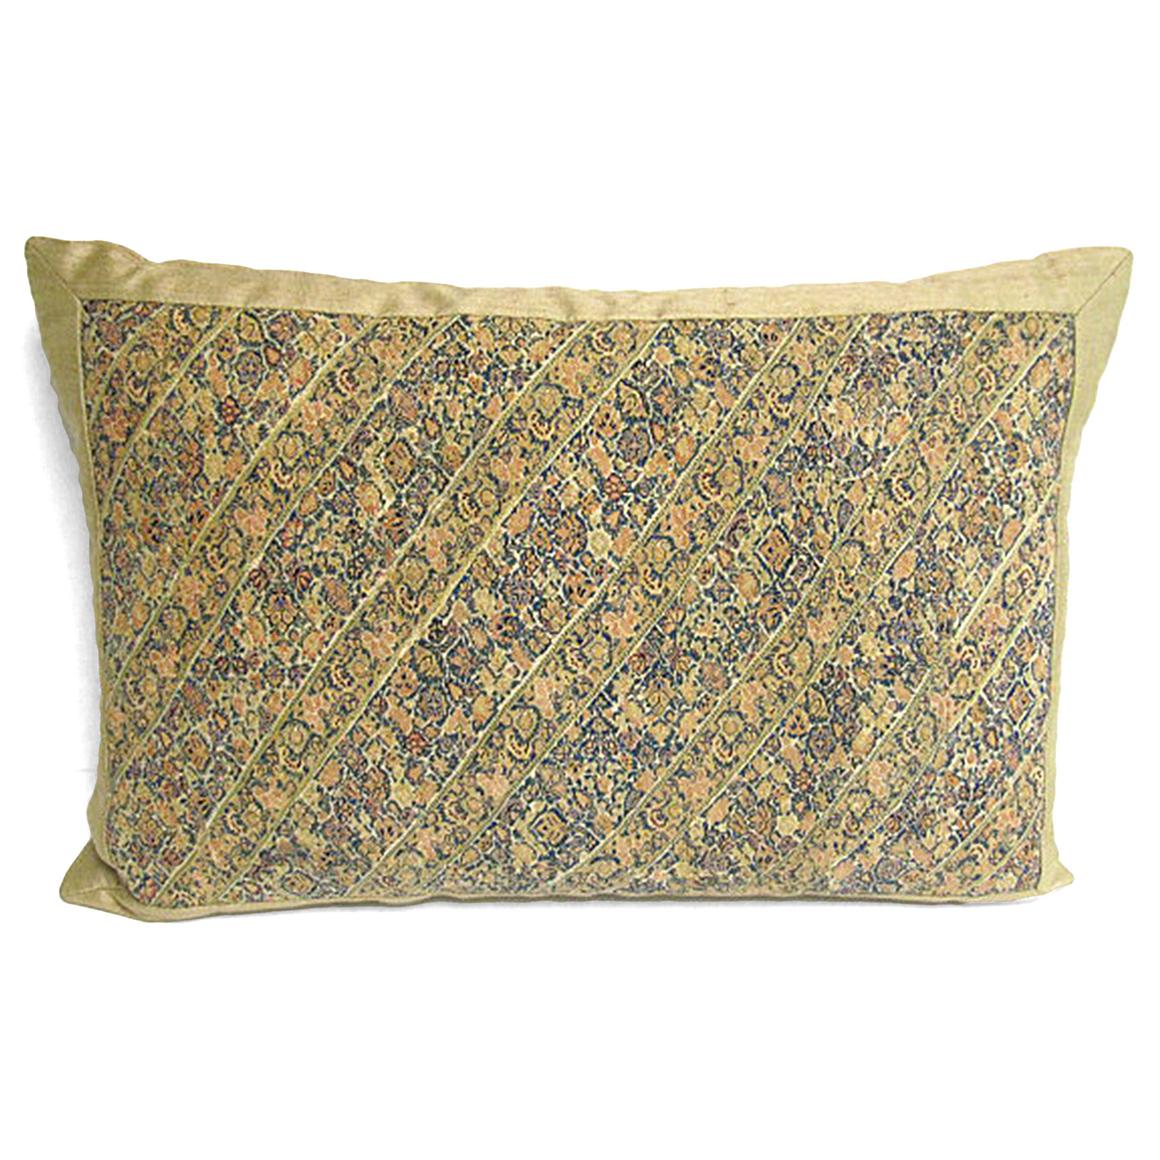 Satin Pillowcase Dublin: Handmade Silk Pillow With 18th Century Persian